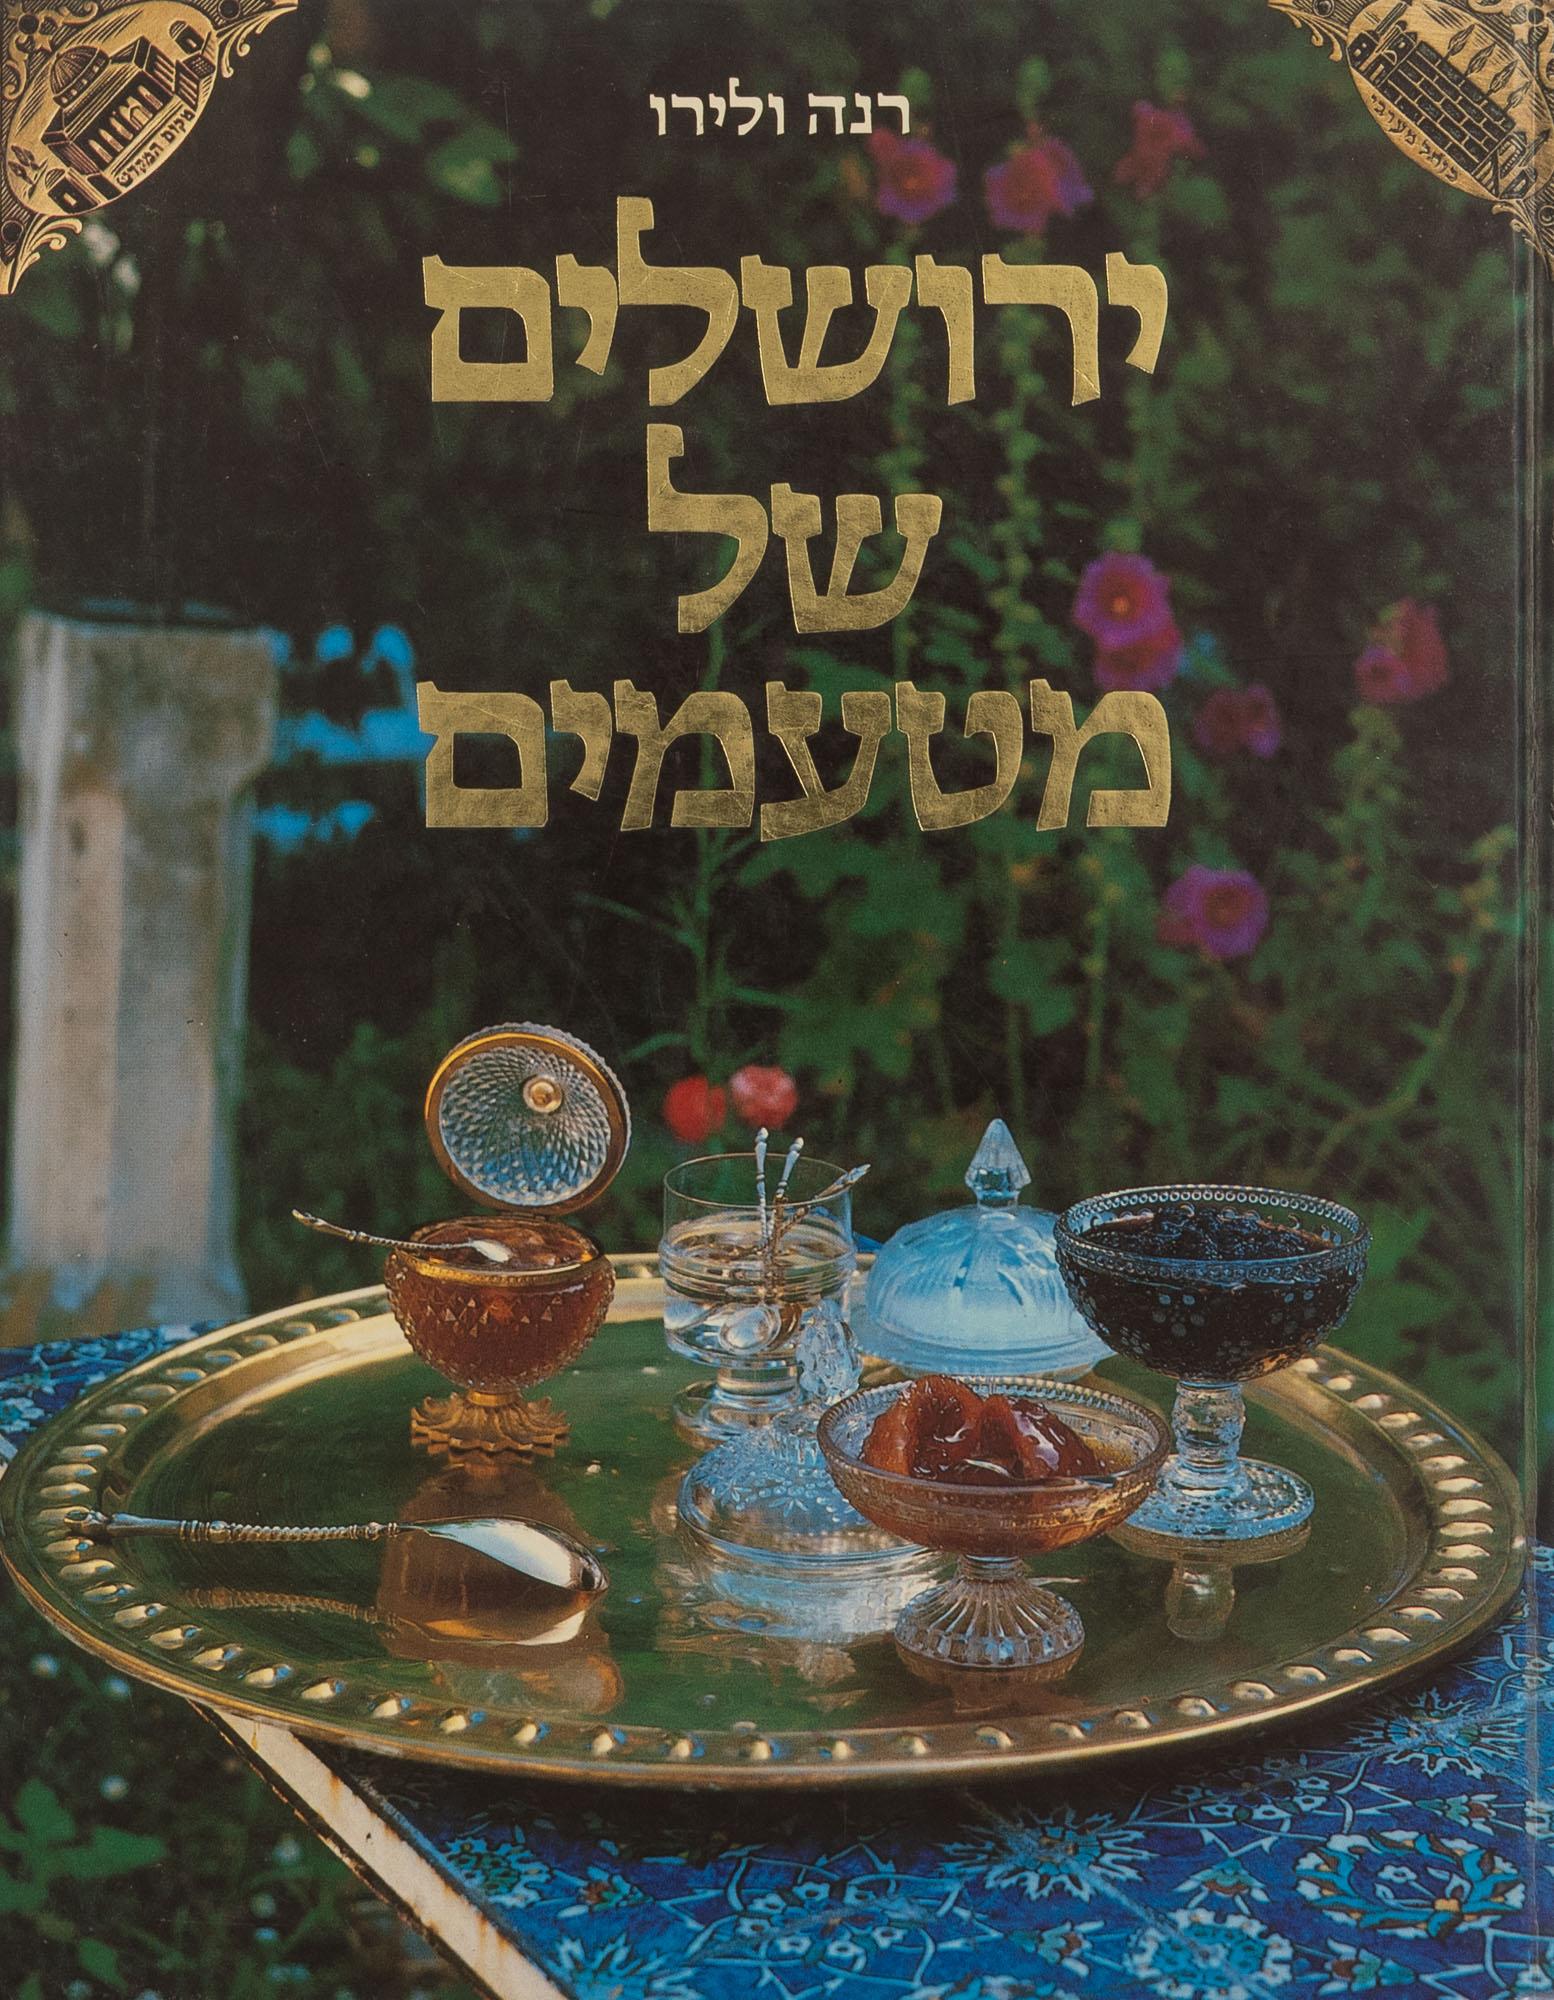 Cover of the Israeli cookbook Delights of Jerusalem